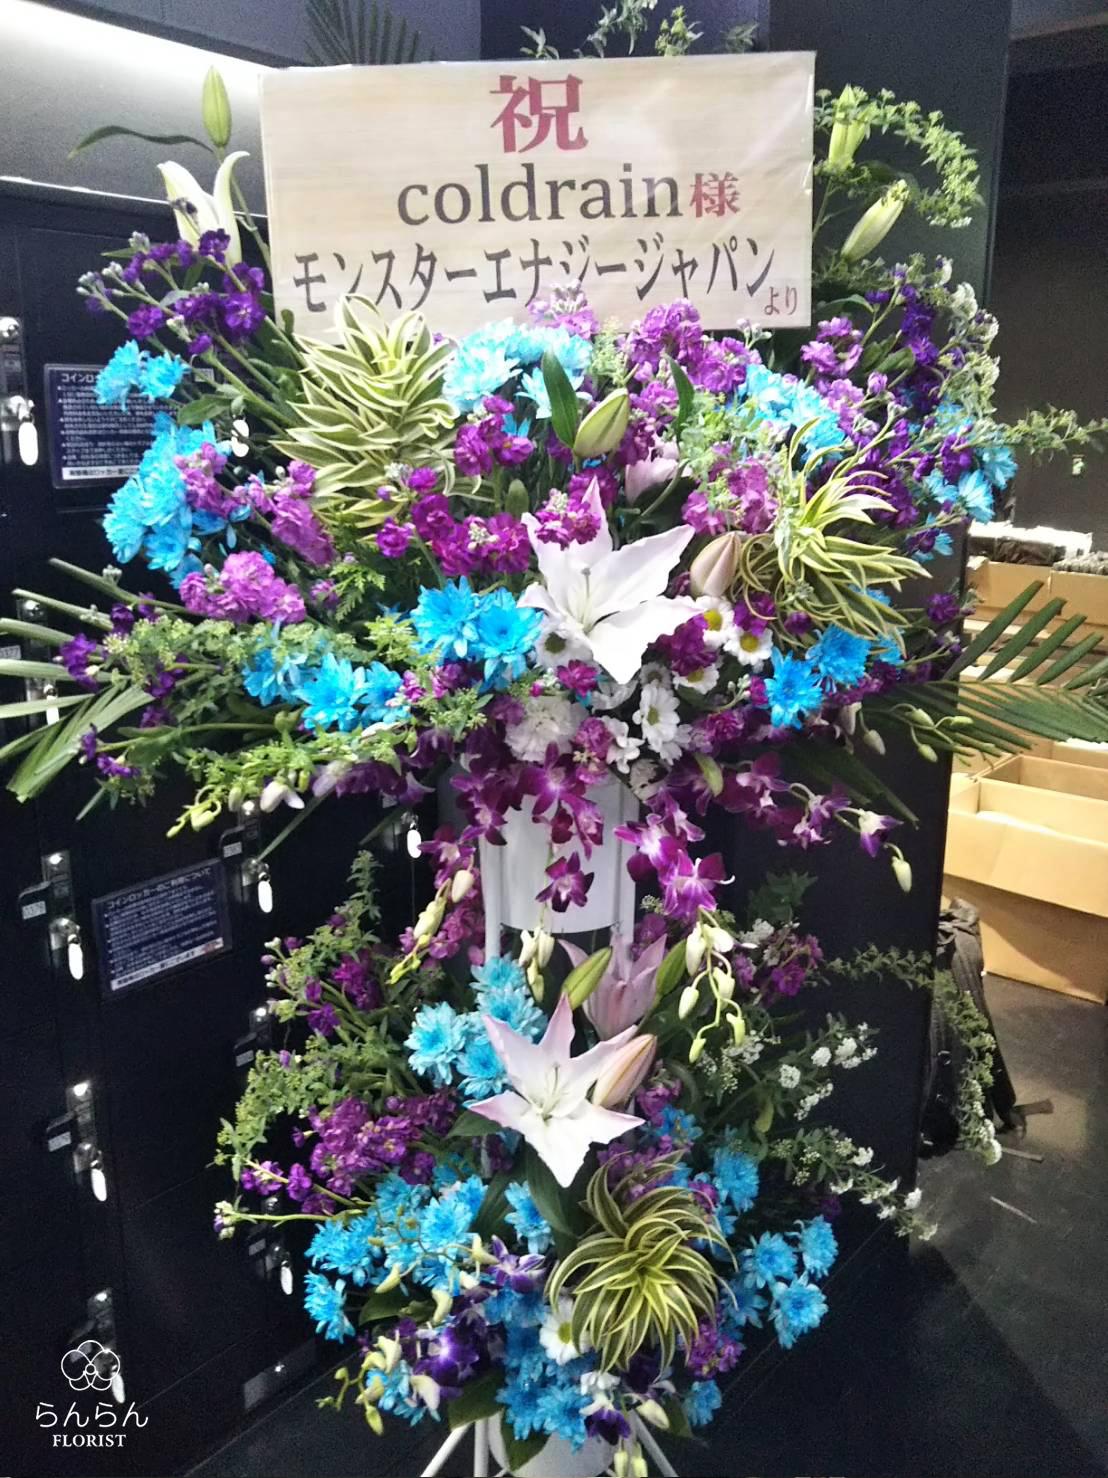 coldrain お祝いスタンド花